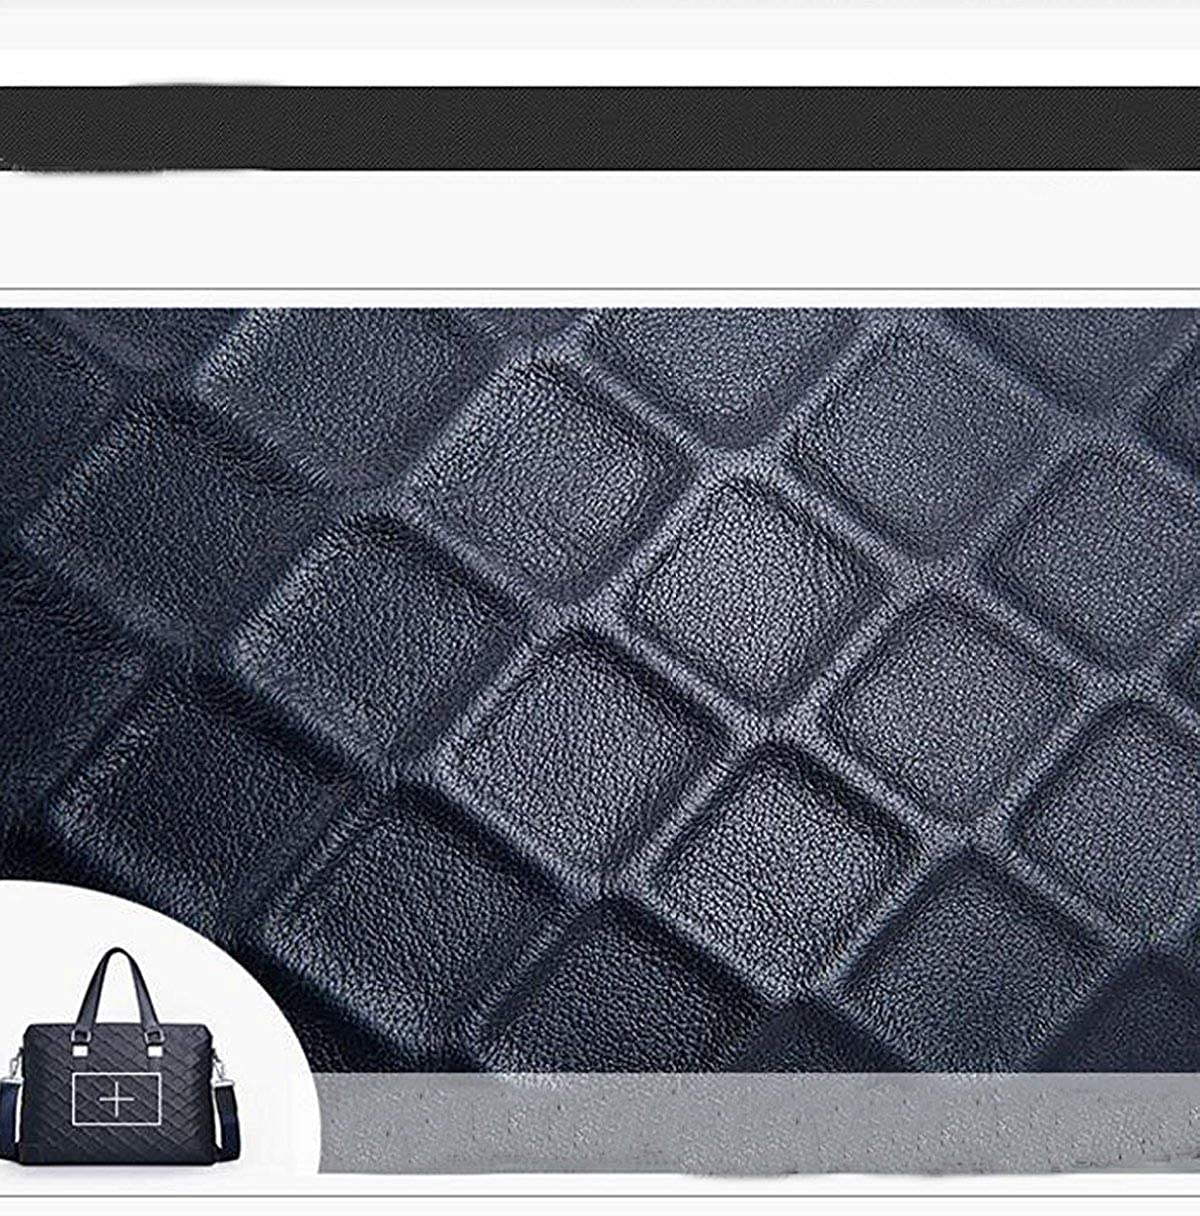 FYH Upmarket Fashion Knurling Business Casual Package Briefcase For Man Multicolor Handbag